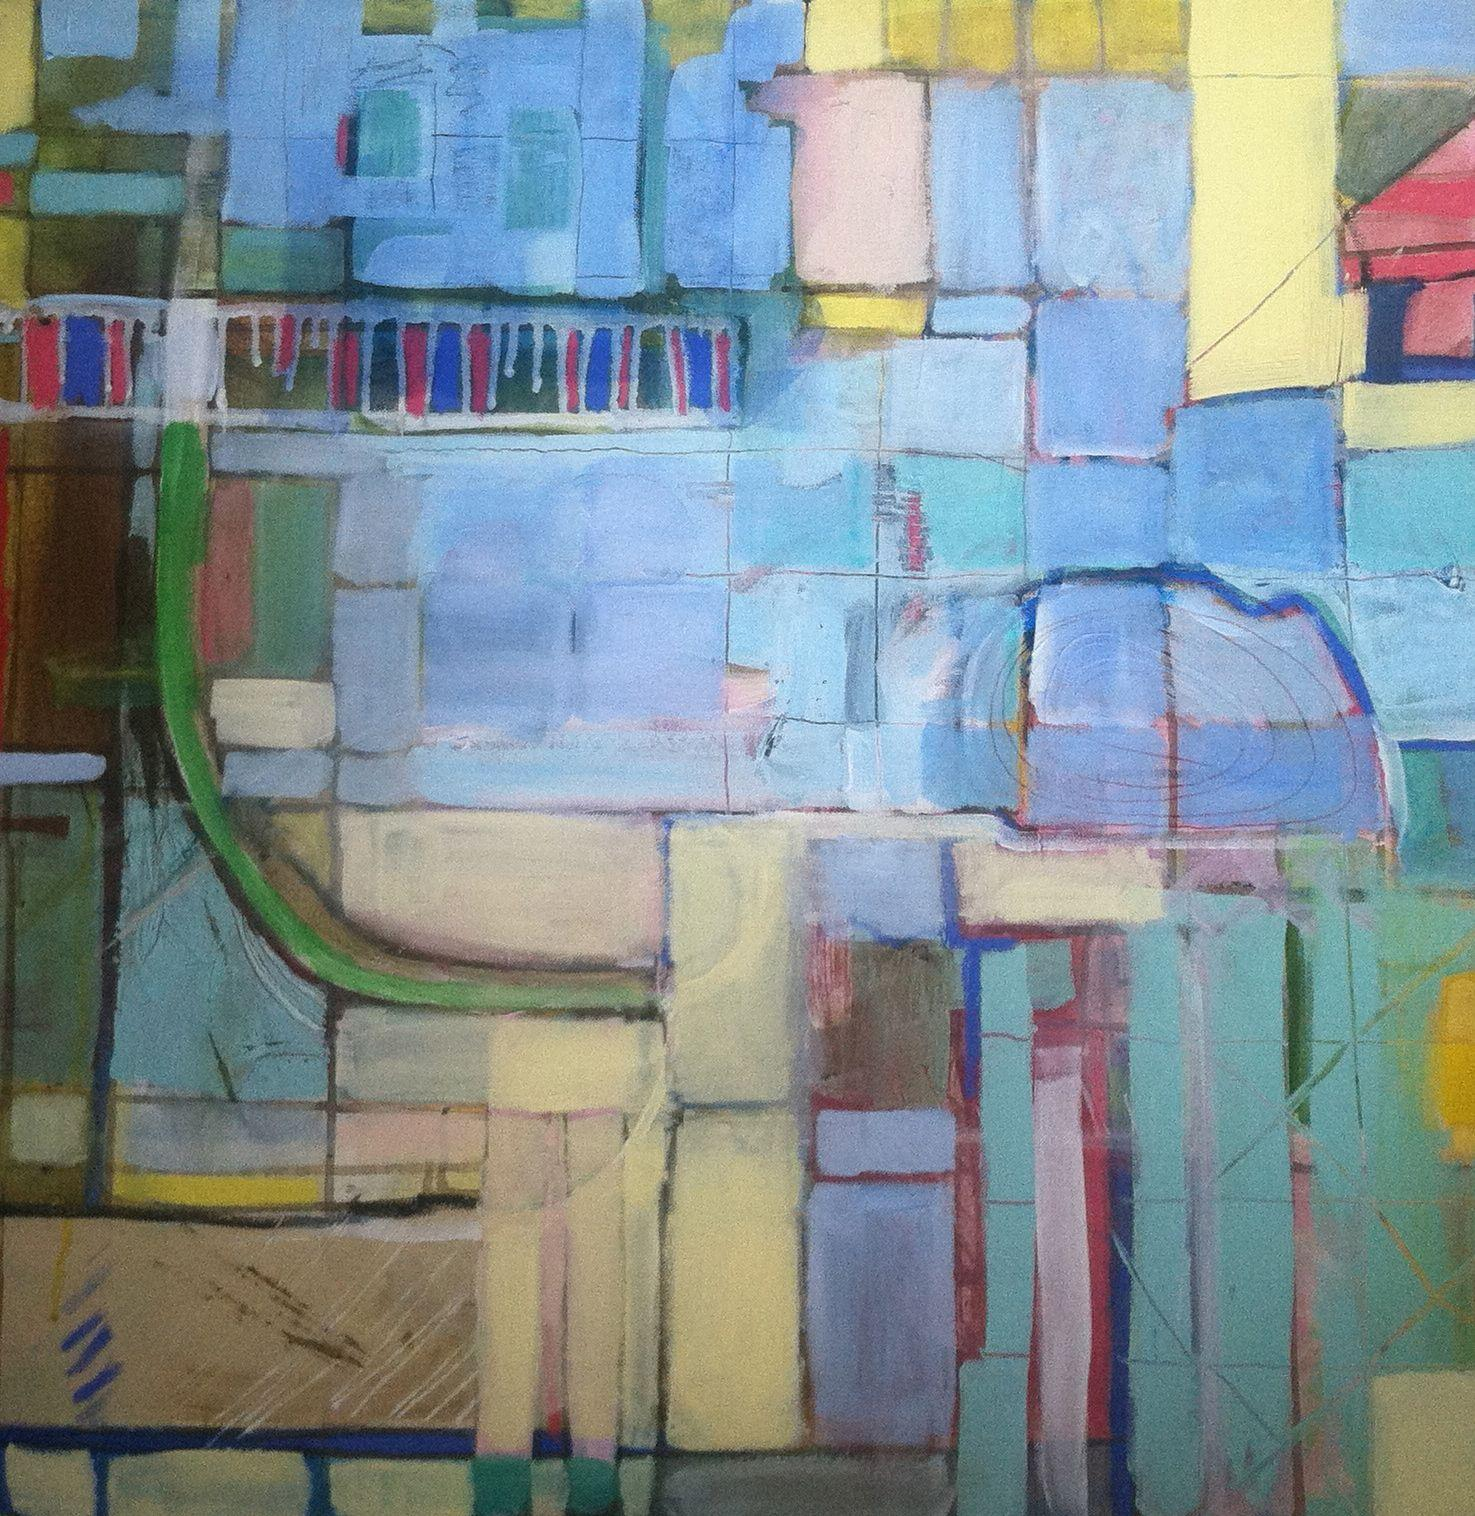 Adult Swim, Painting, Acrylic on Canvas